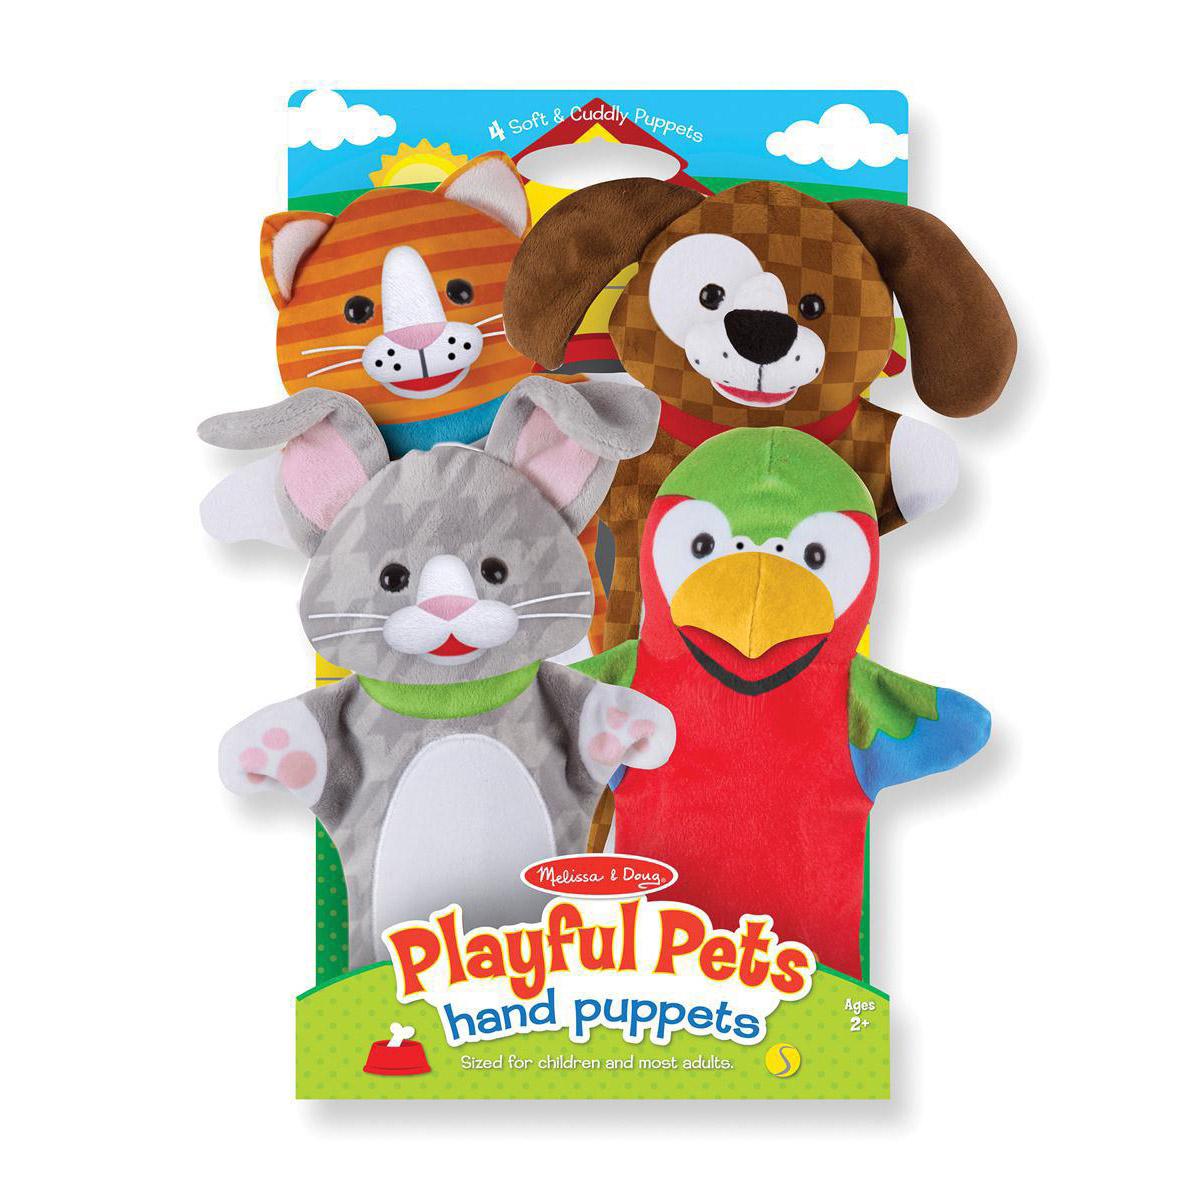 Playful Pets Hand Puppets